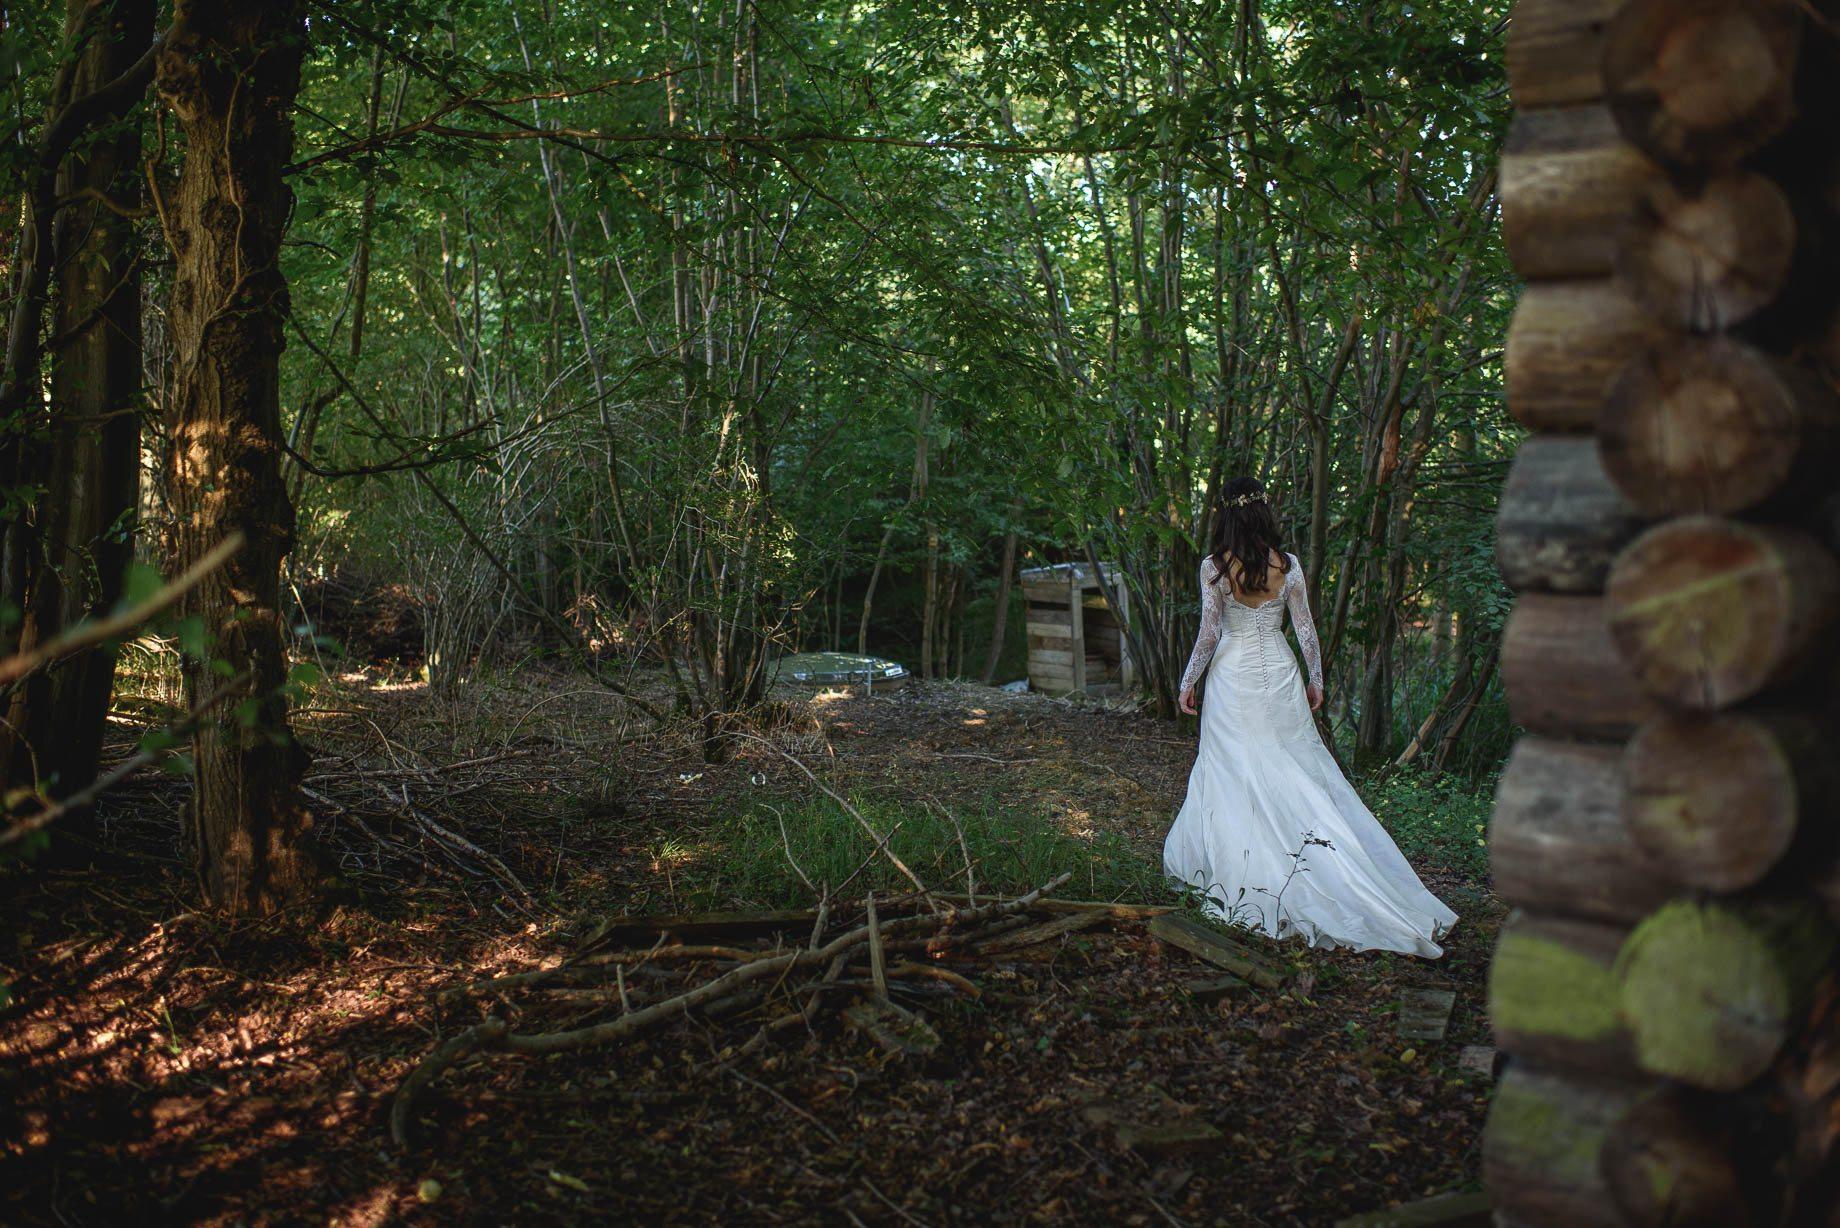 Gildings Barn wedding photography - Sarah and Steve (160 of 190)